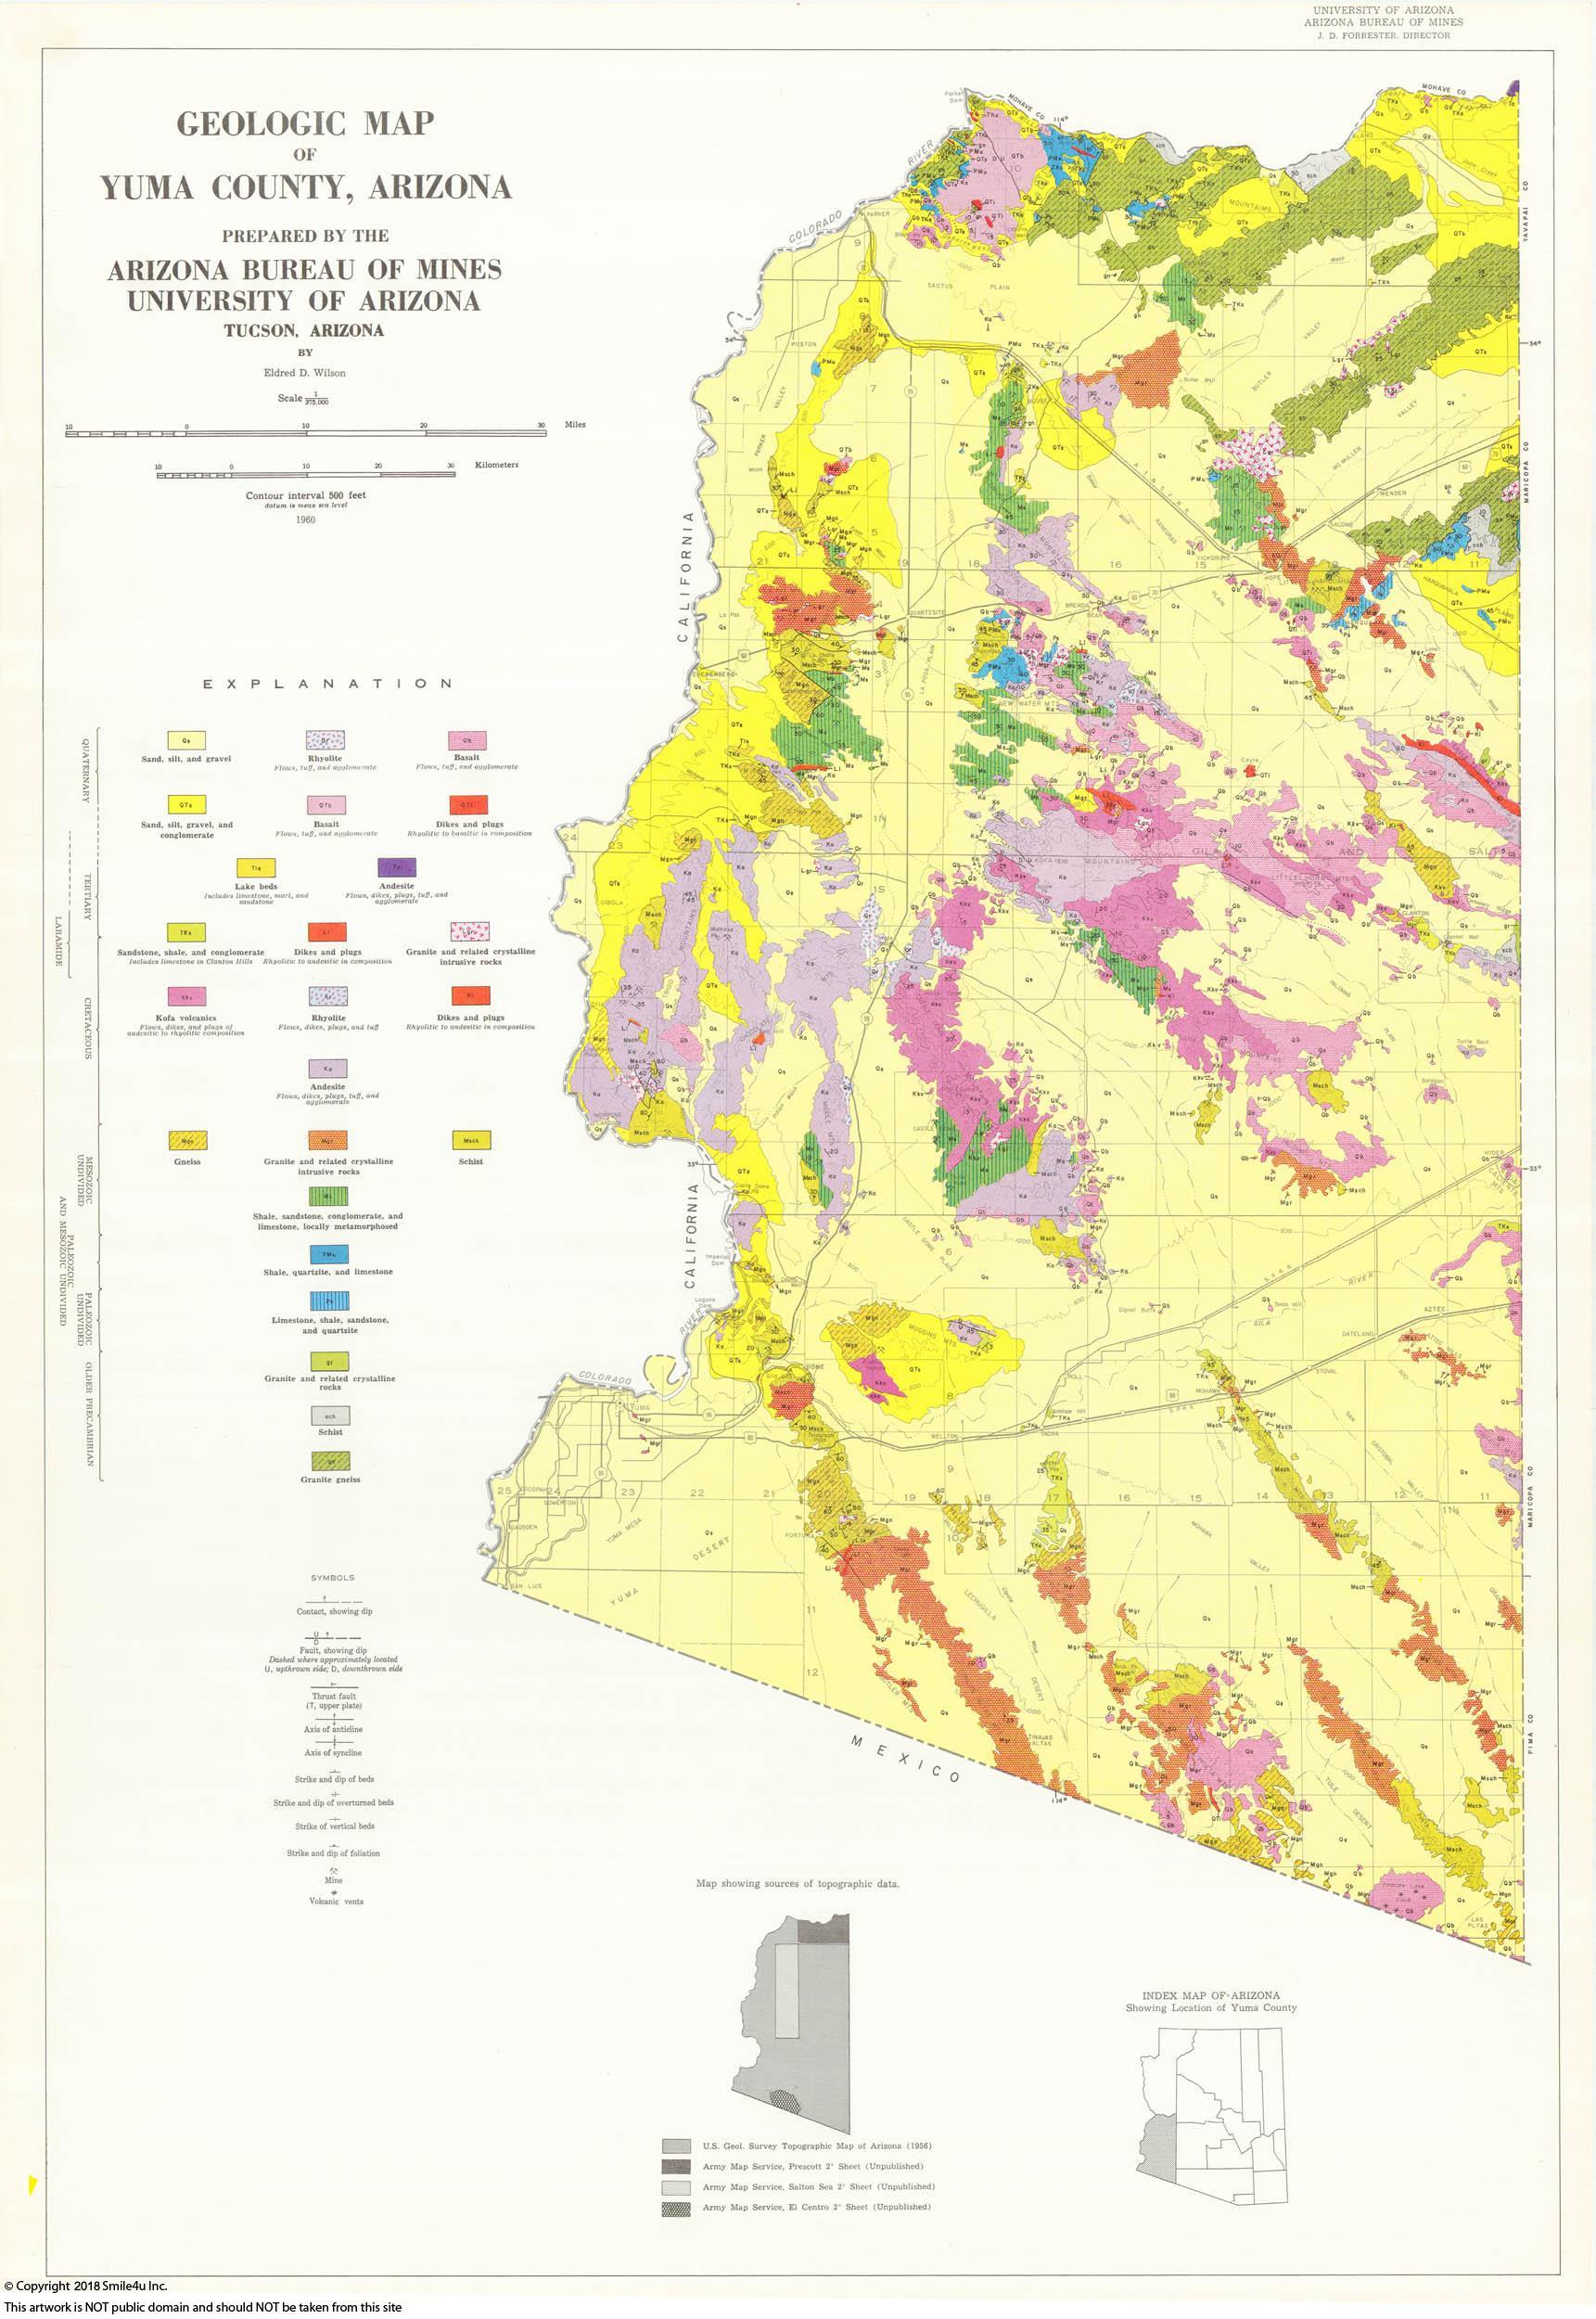 512392_watermarked_yumacounty_1960_geologicmap.jpg